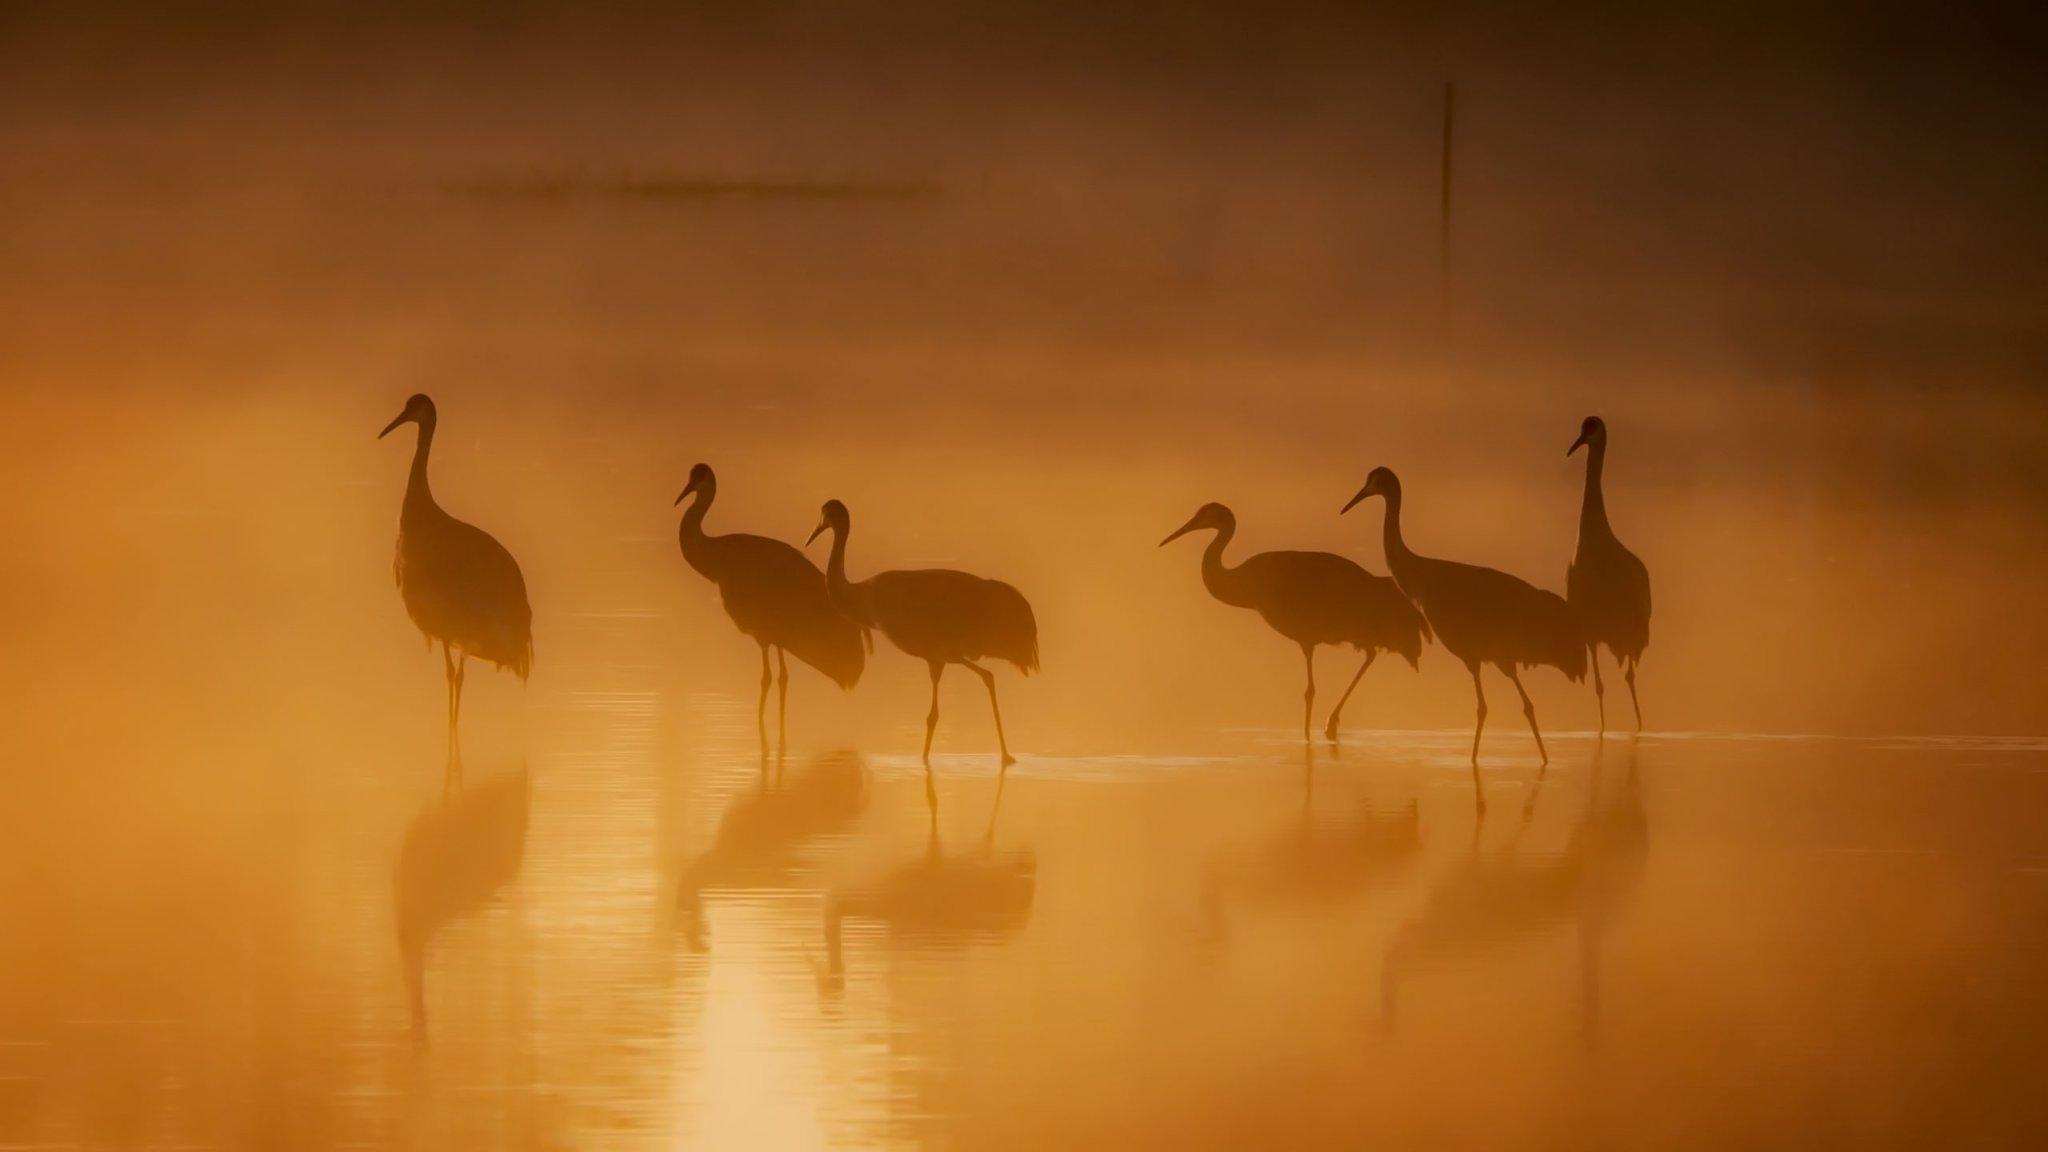 Capturing more striking bird photographs